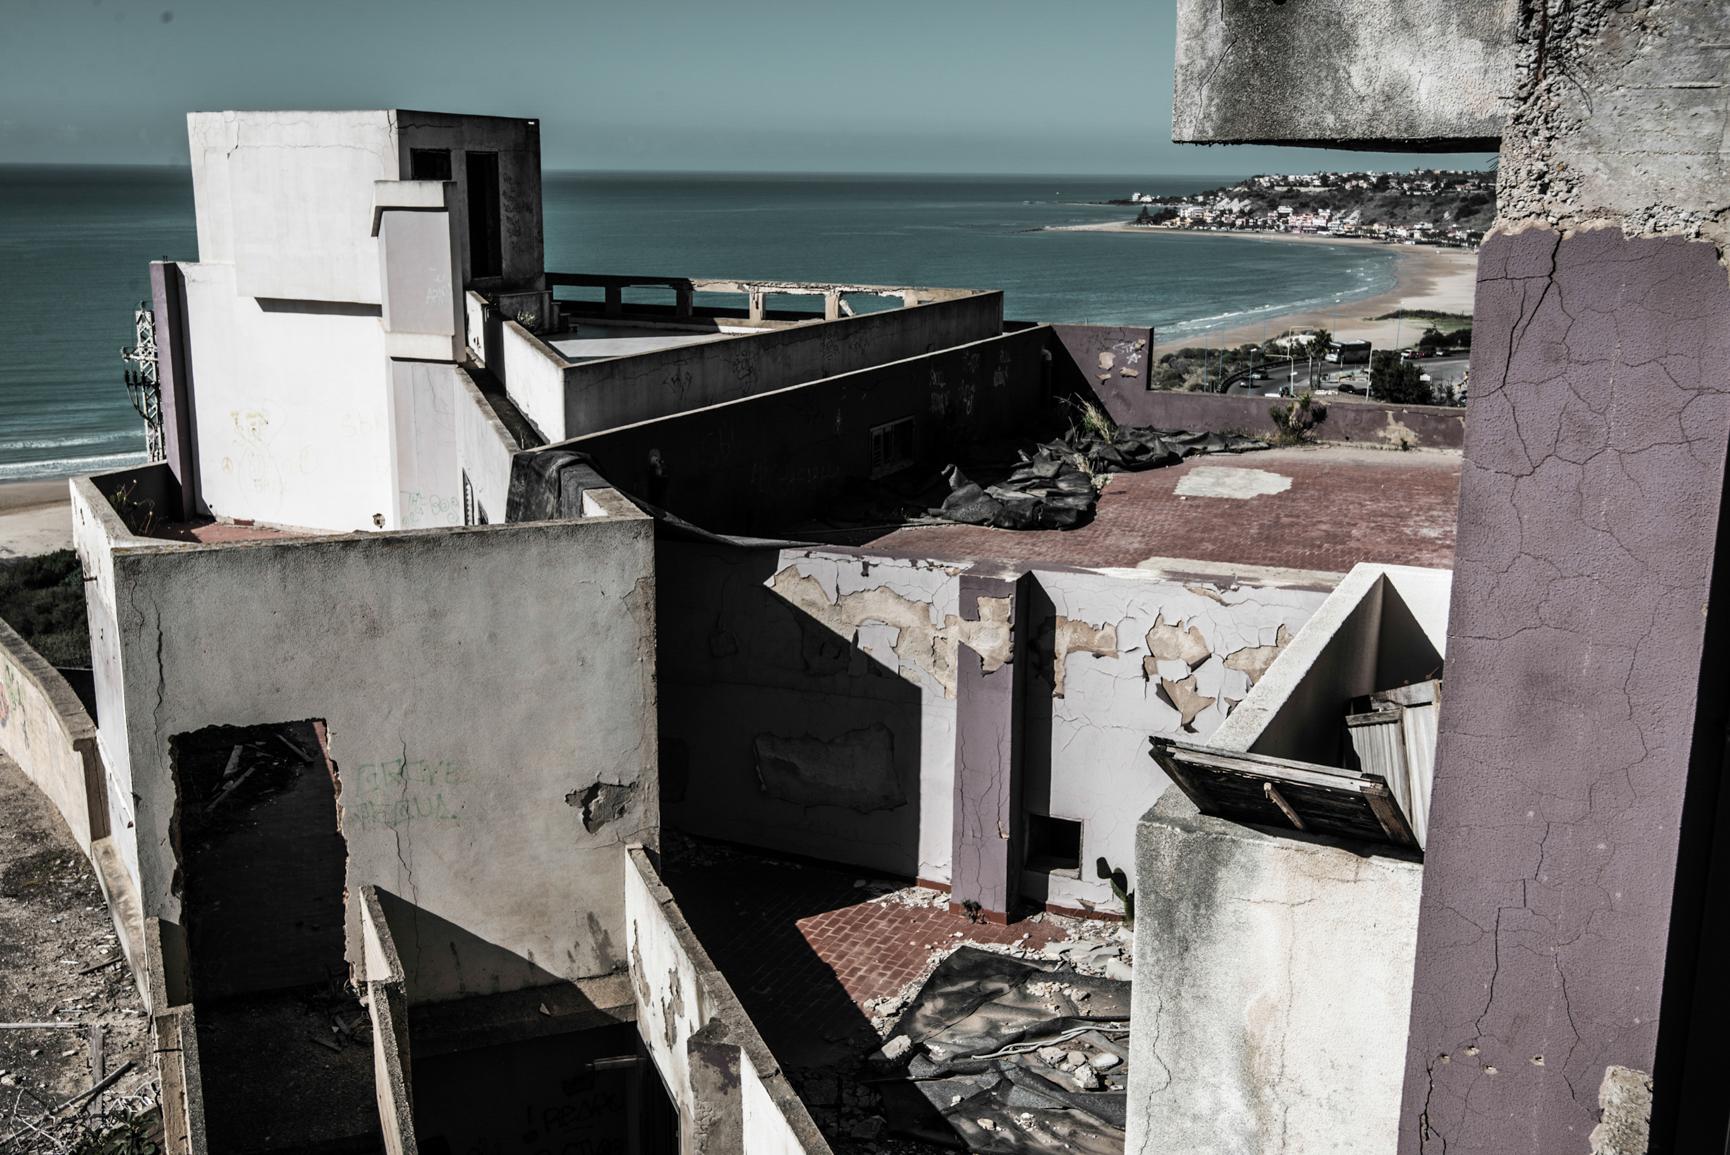 portoempedocle (agrigento) Hotel africa (14).jpg